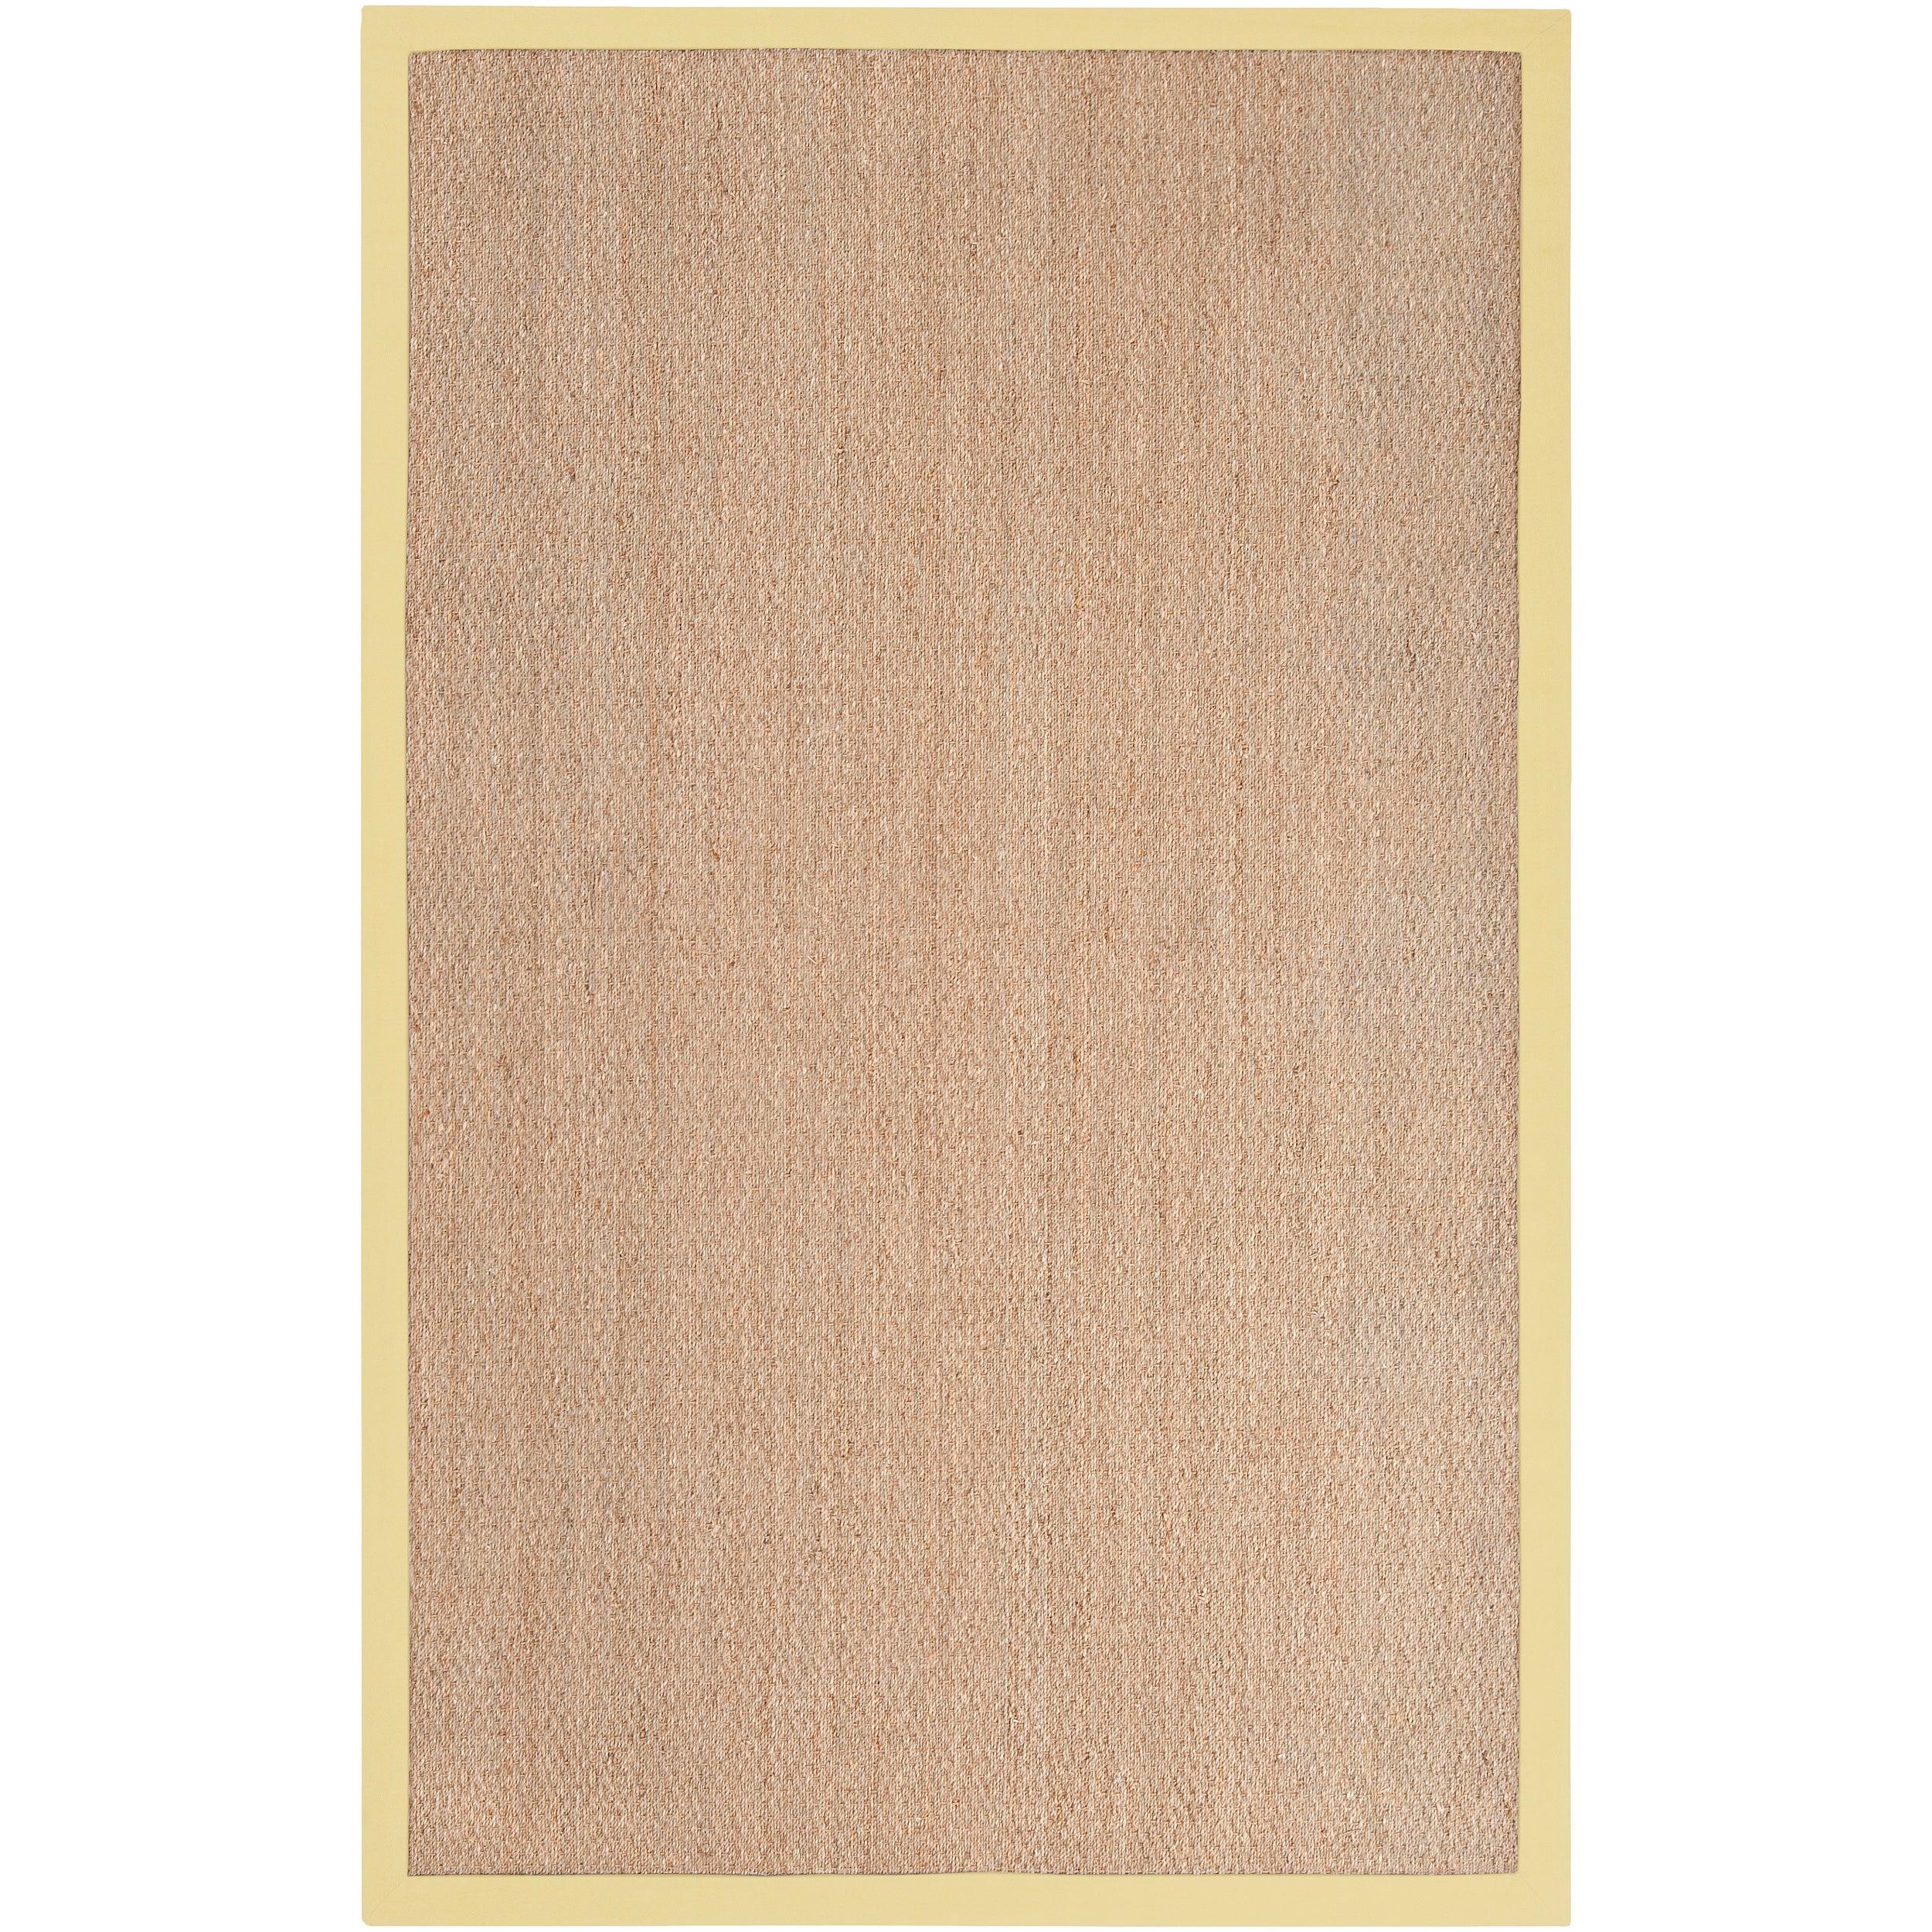 Hand-woven Yellow Tactical Natural Fiber Seagrass Cotton Border Rug (8' x 10')